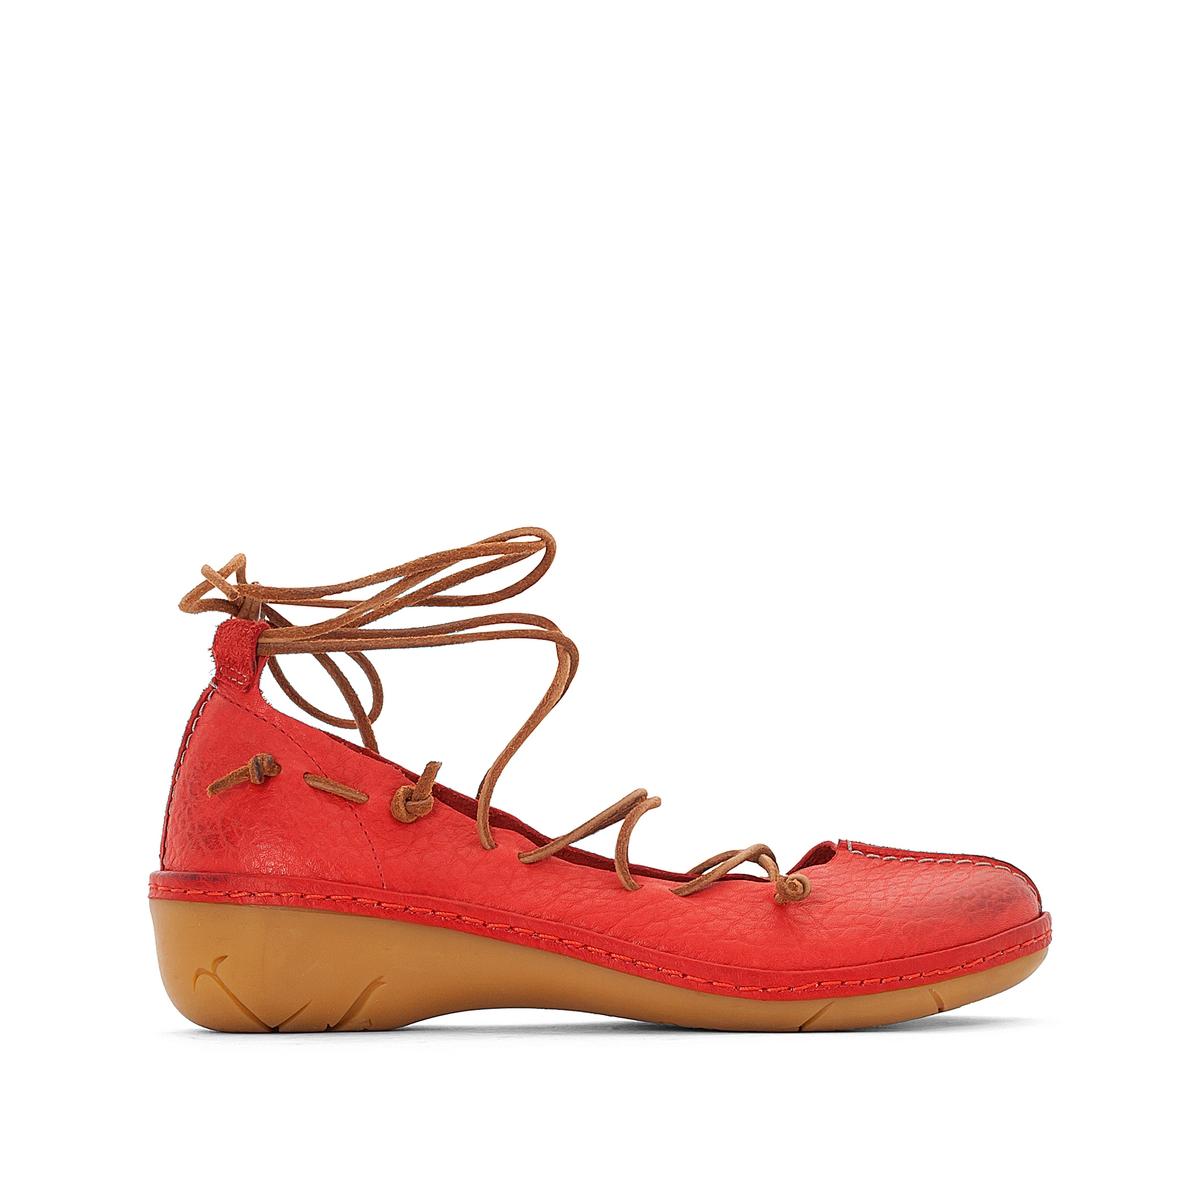 Балетки кожаные на шнуровке Napea